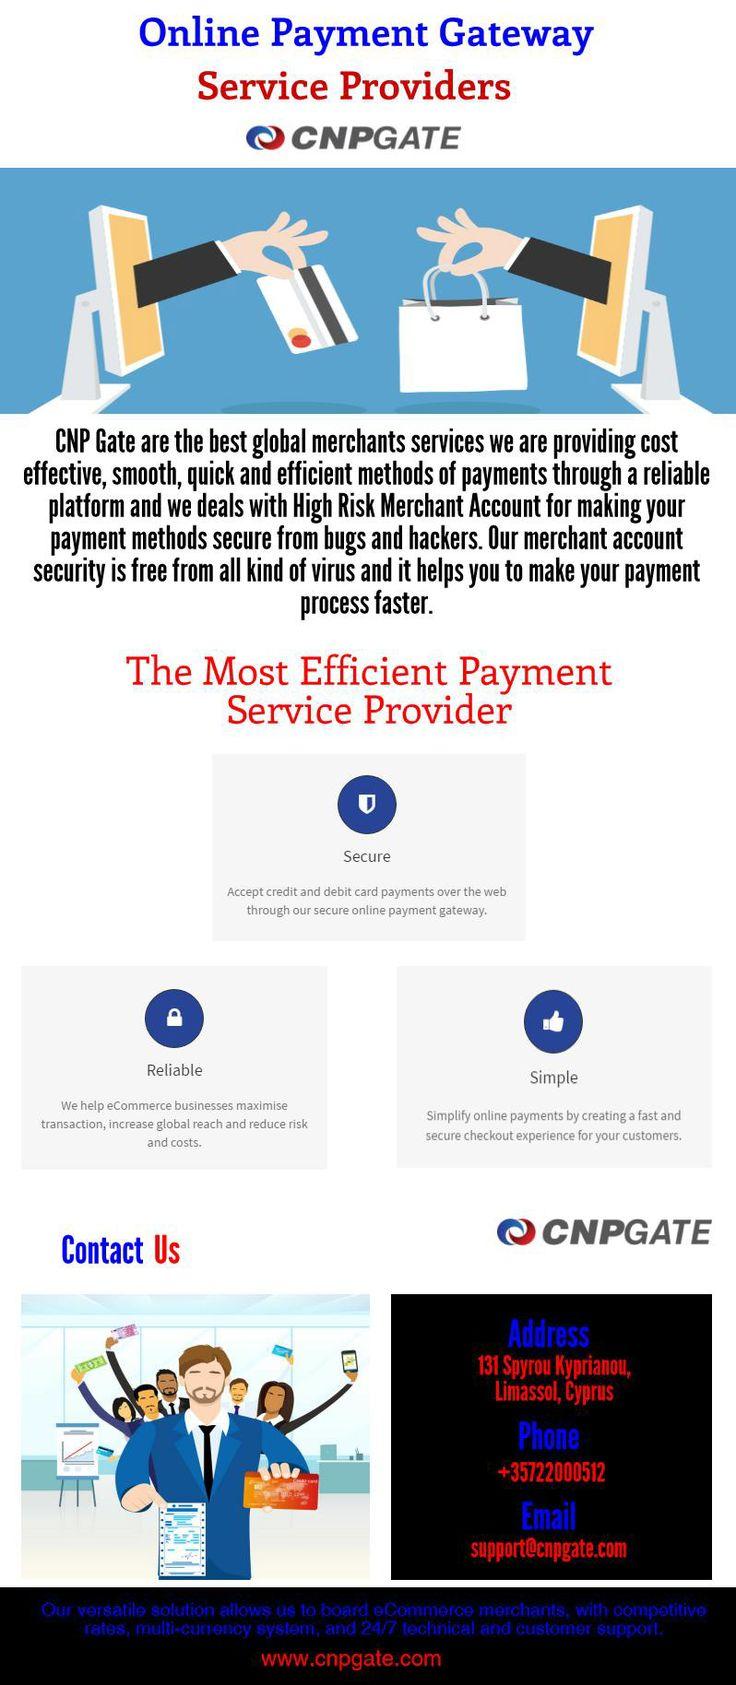 Account colorado casino internet merchant offshore casino printing